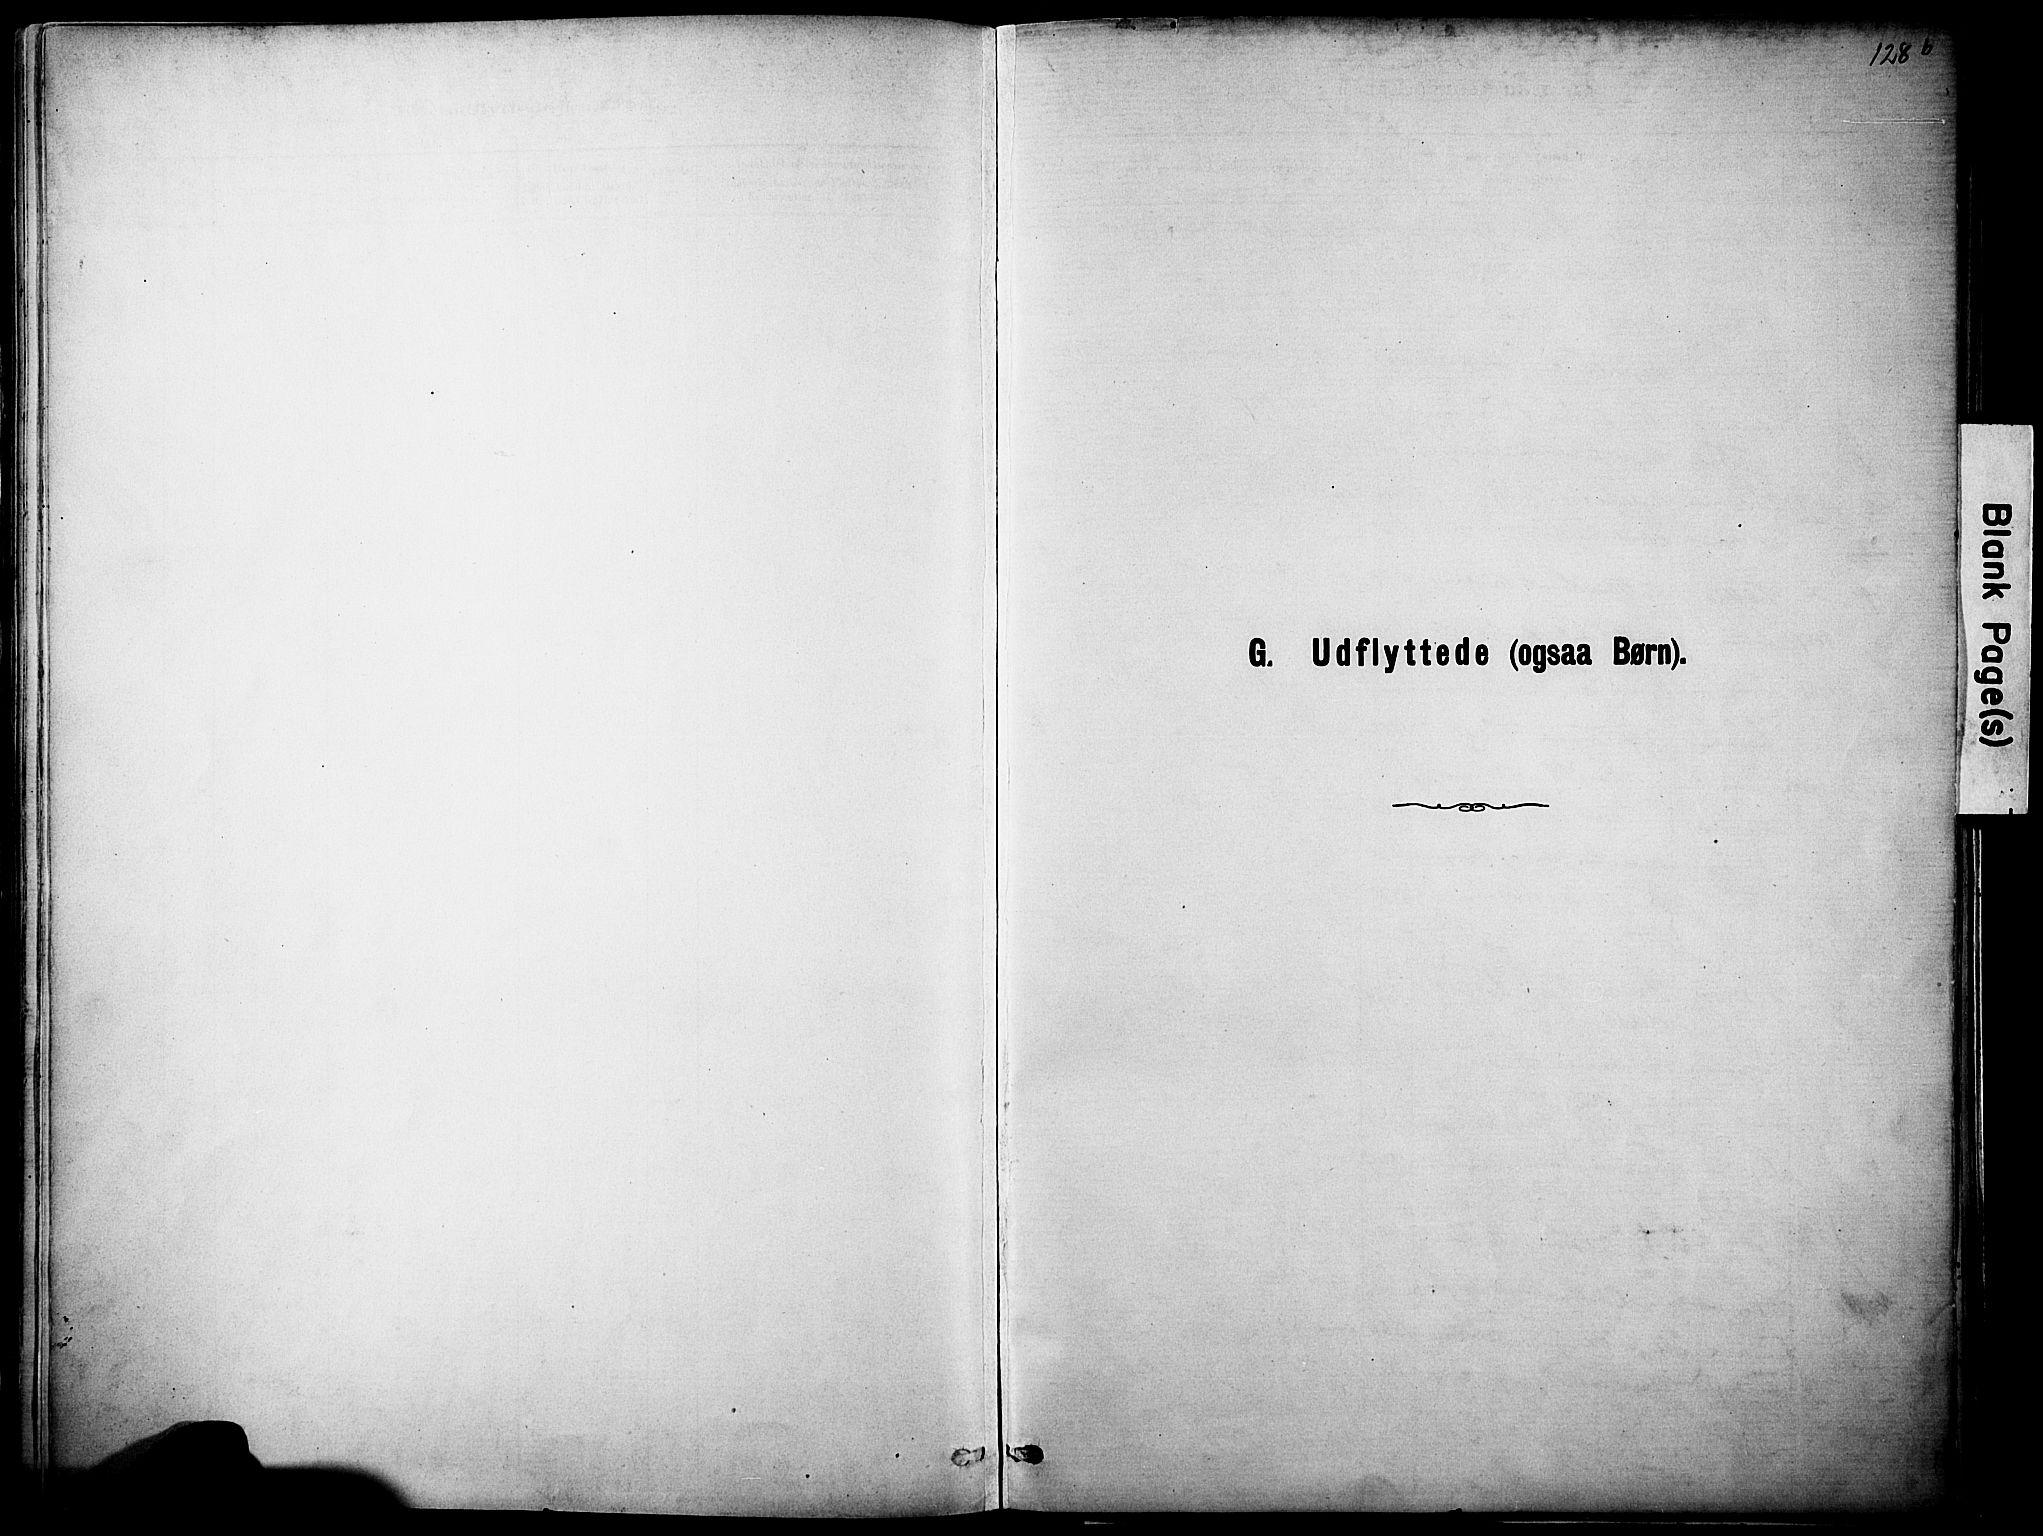 SAH, Vågå prestekontor, Ministerialbok nr. 10, 1887-1904, s. 128